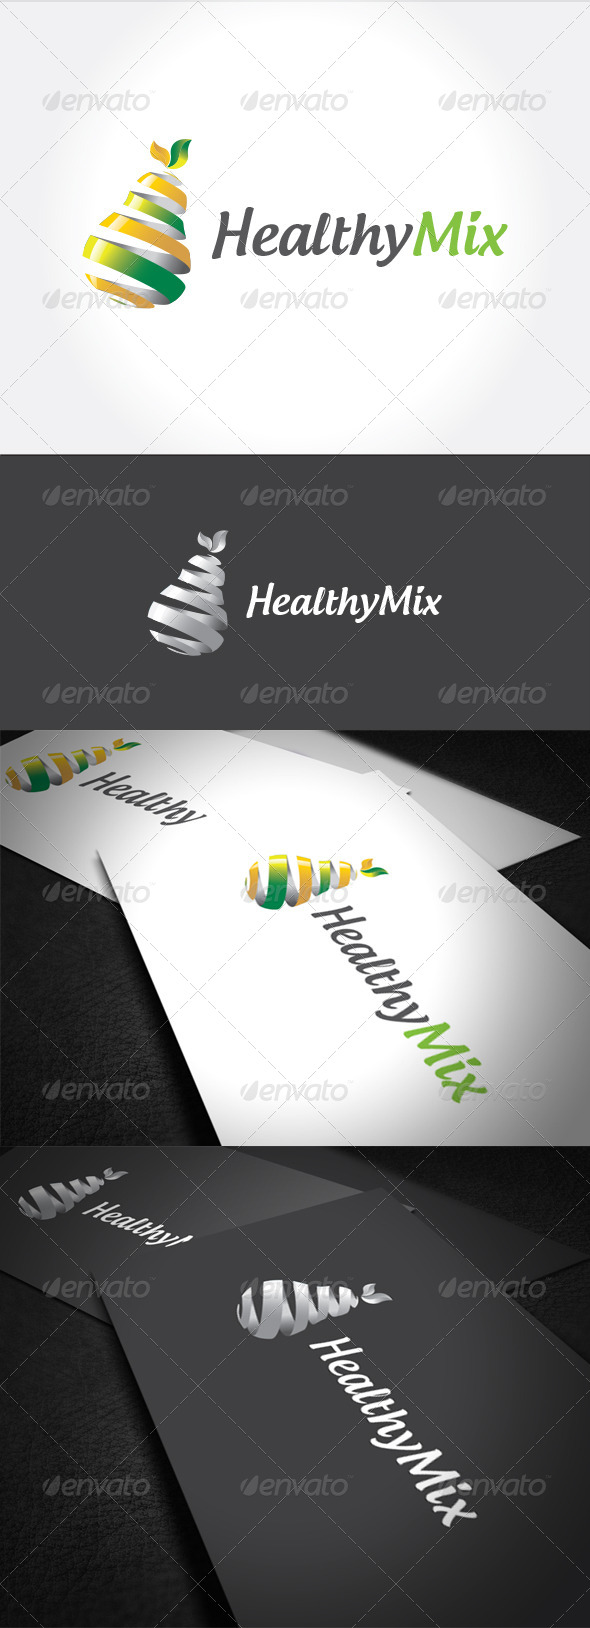 Healty Mix Logo Template - Food Logo Templates